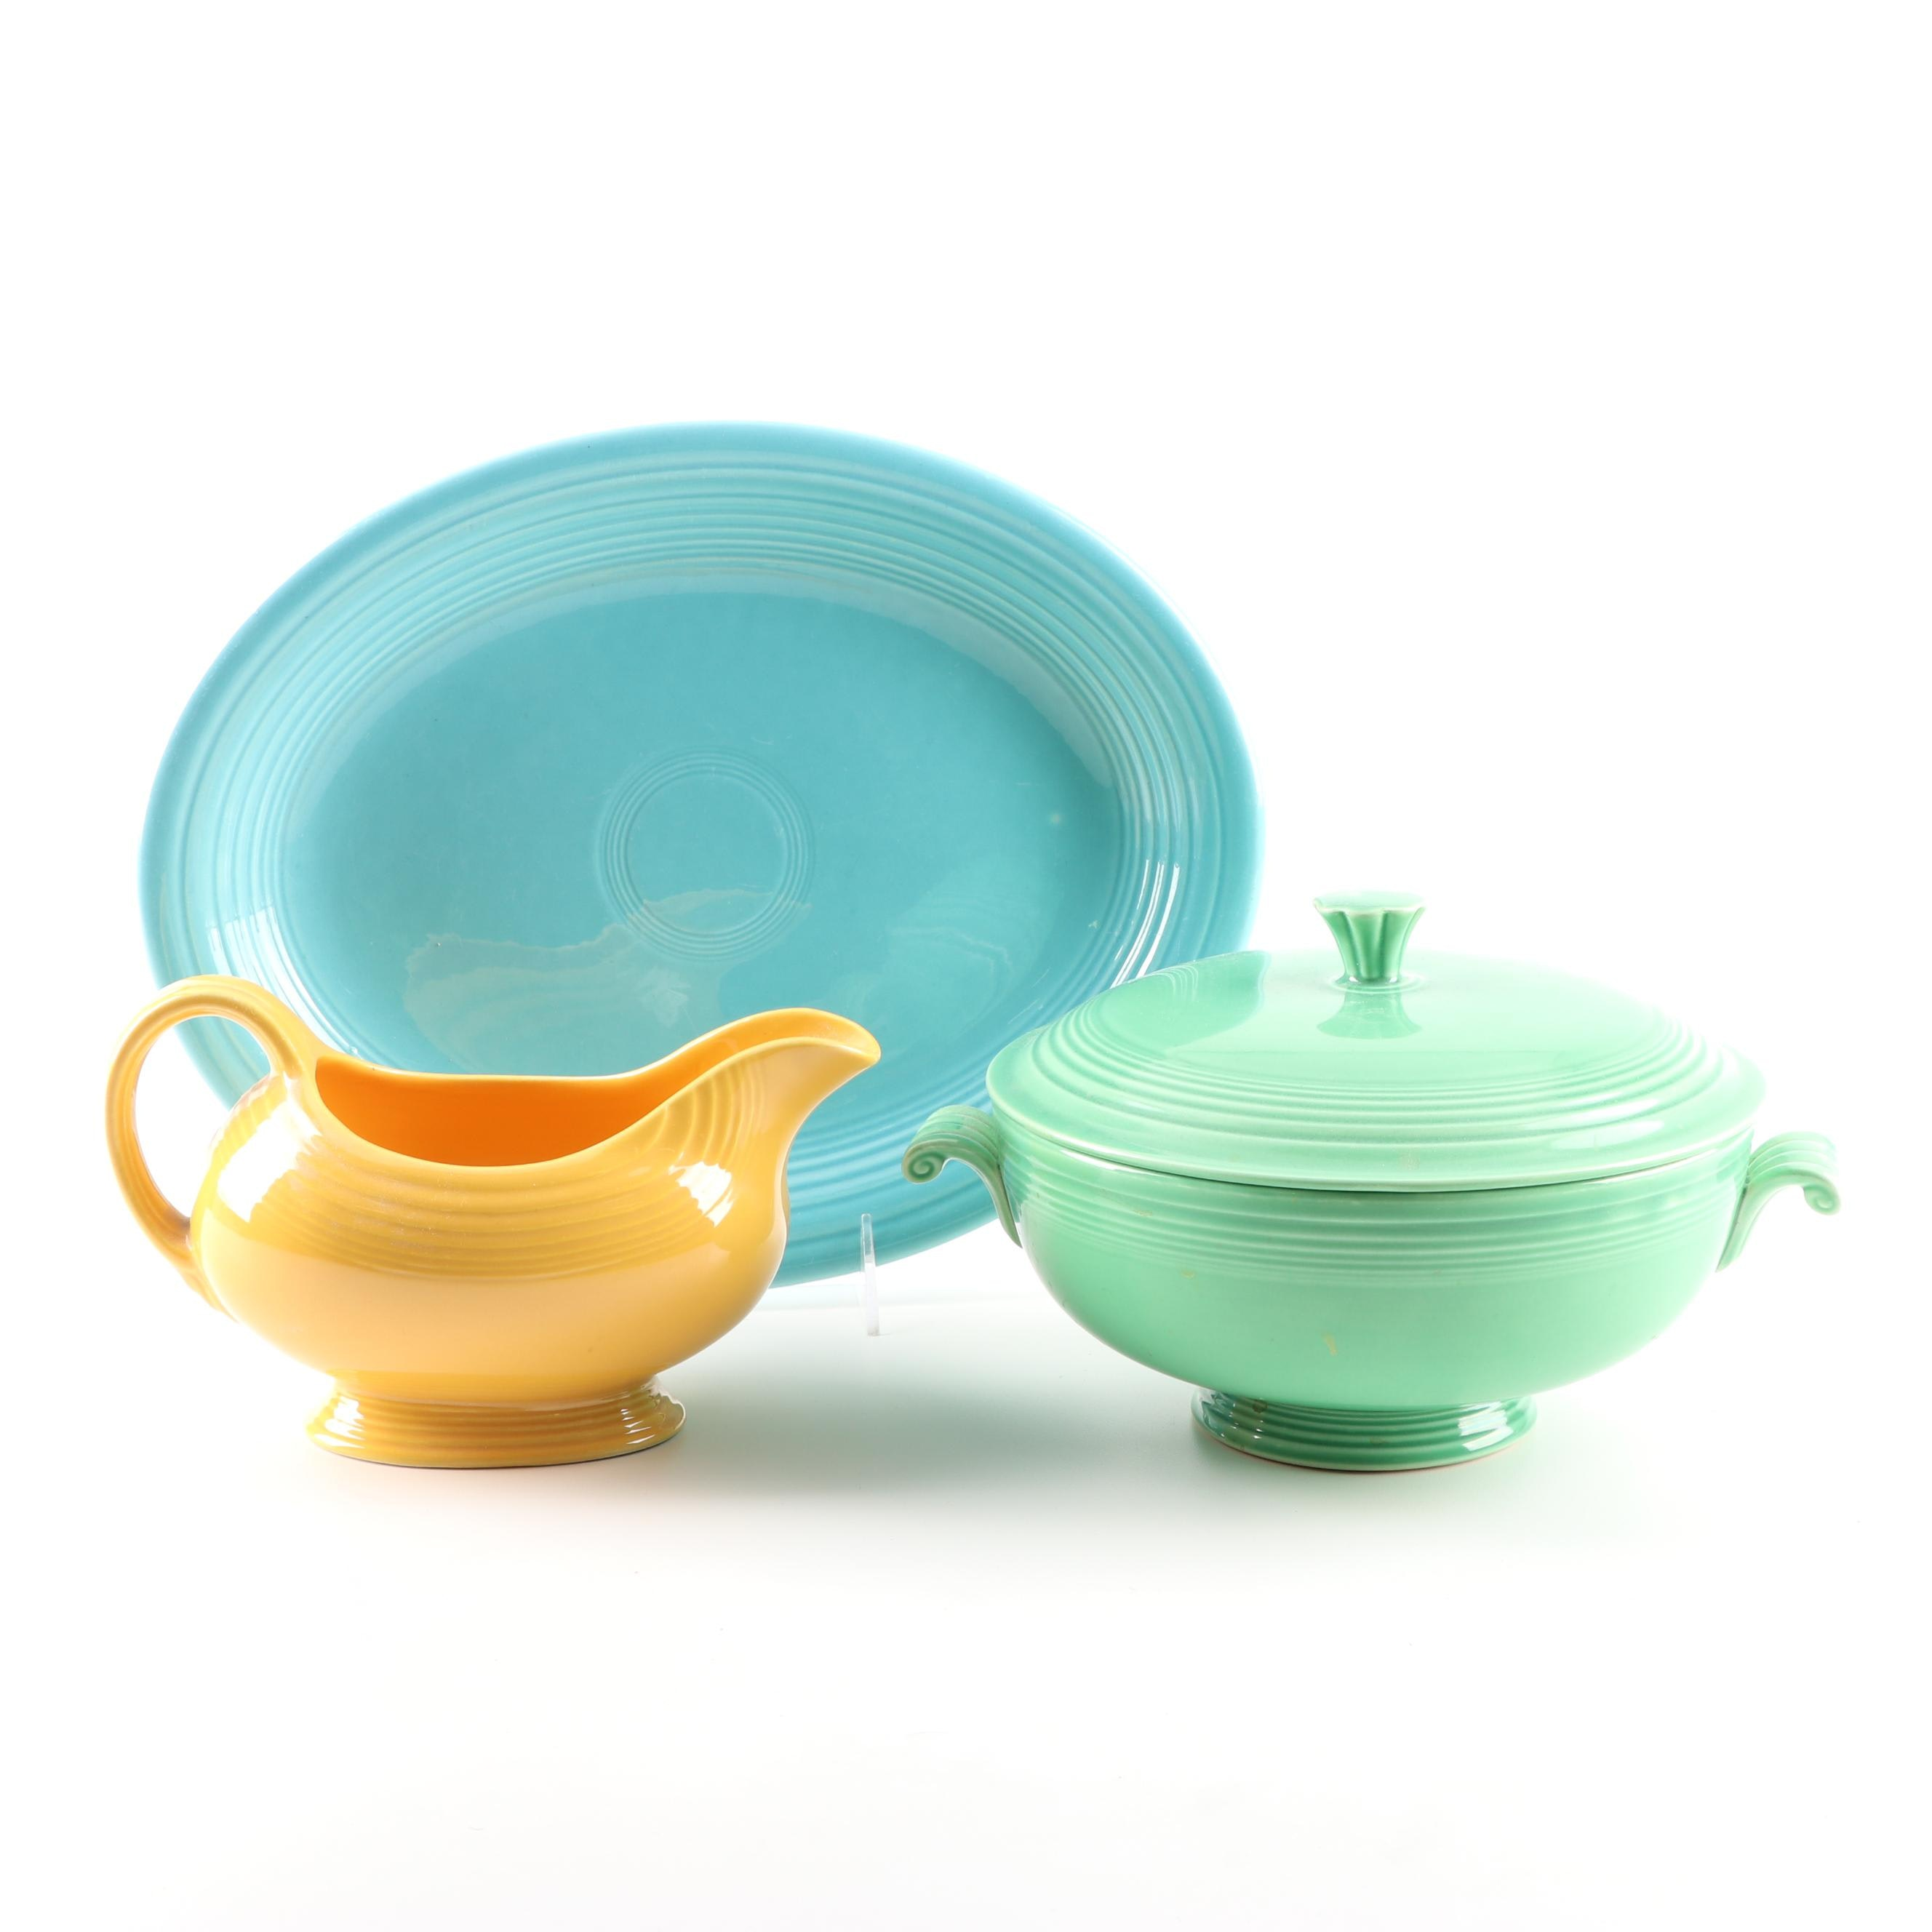 "Homer Laughlin ""Fiesta"" Ceramic Serveware, 1936-69"